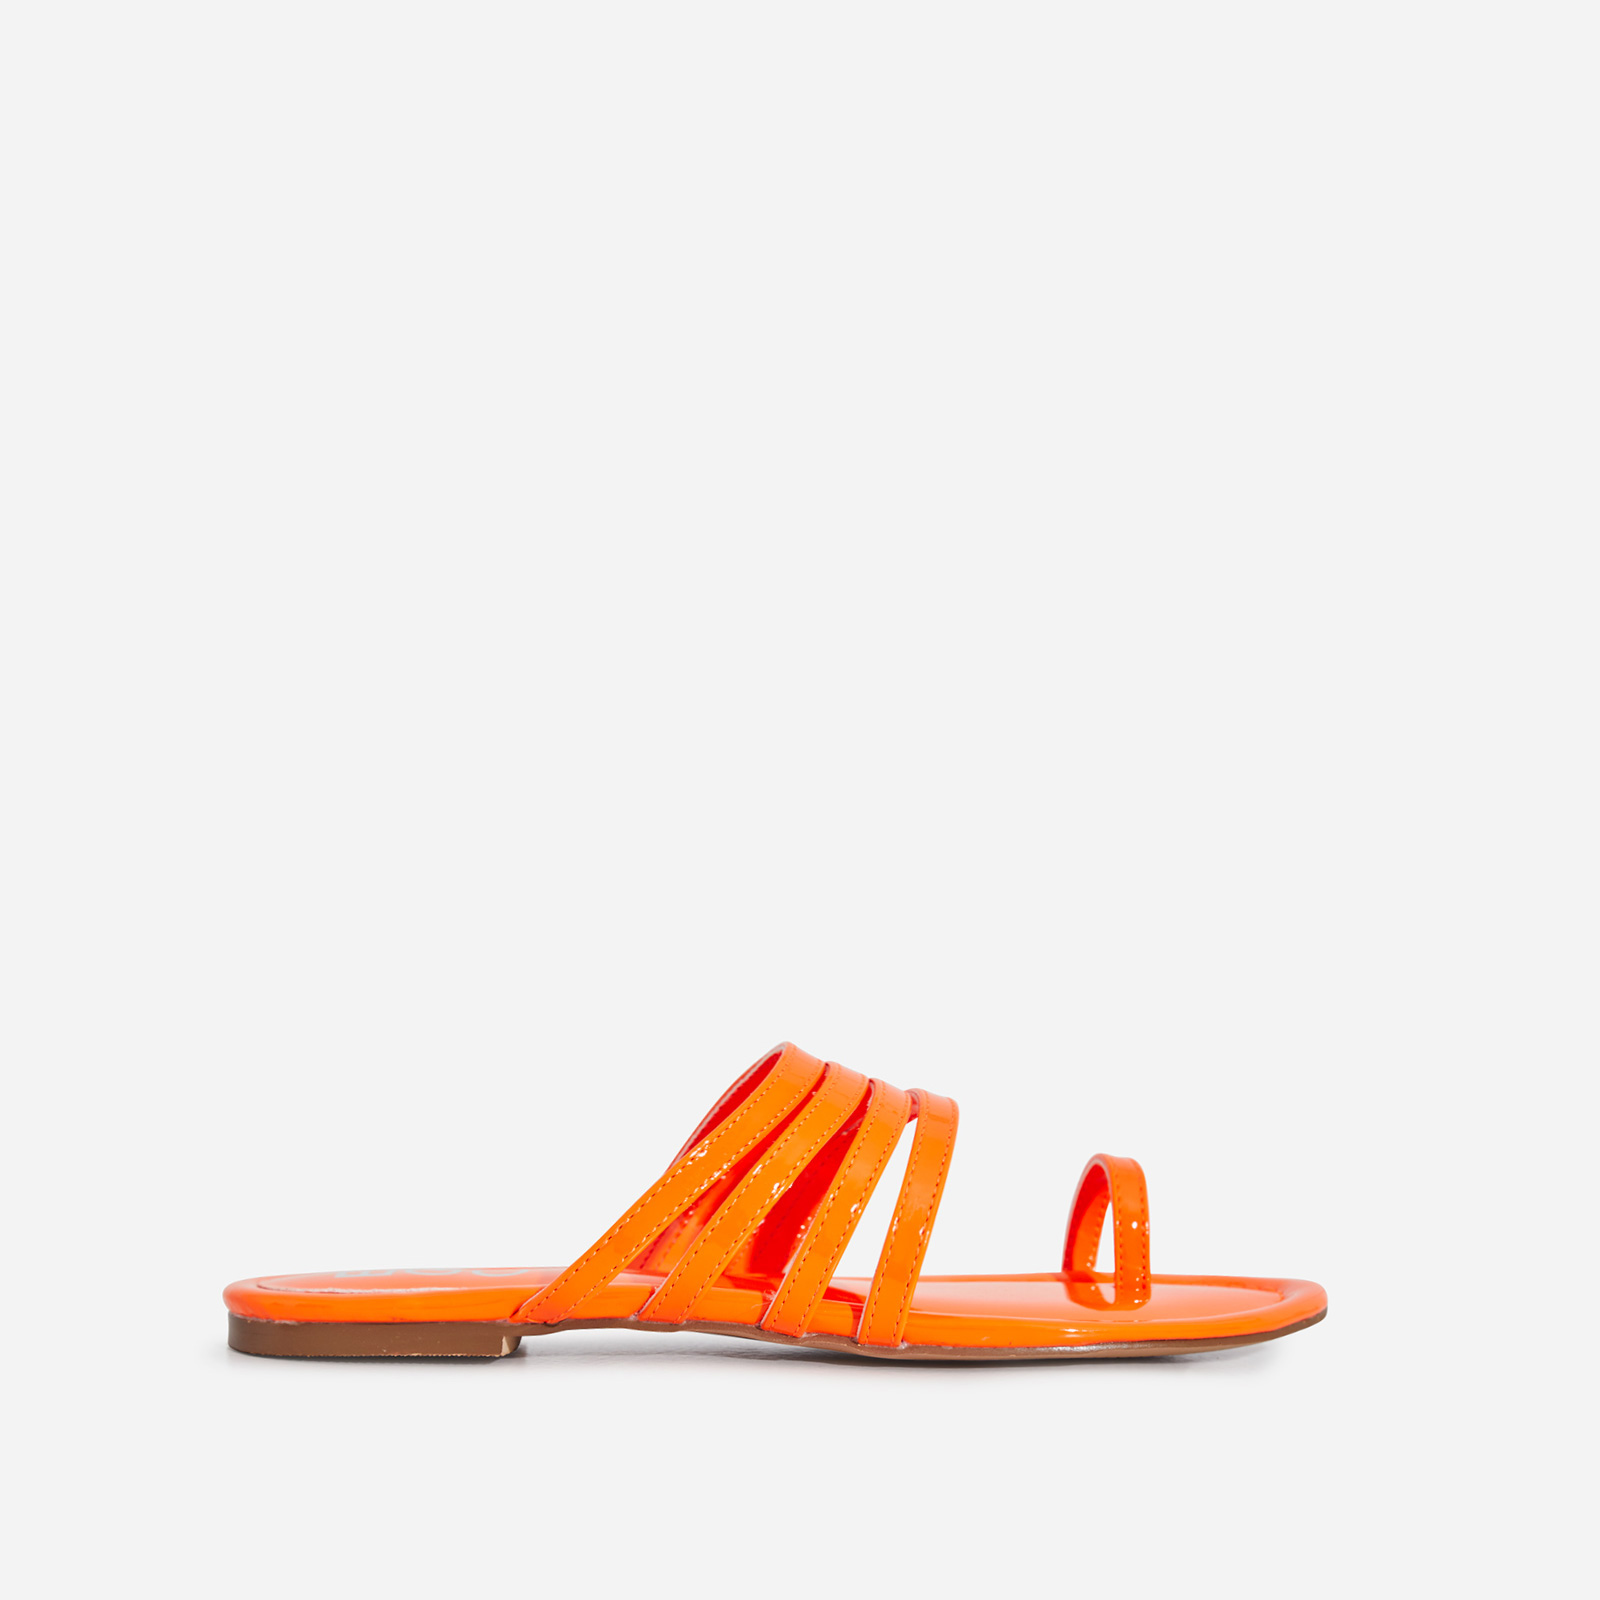 Dax Toe Strap Flat Sandal In Orange Patent